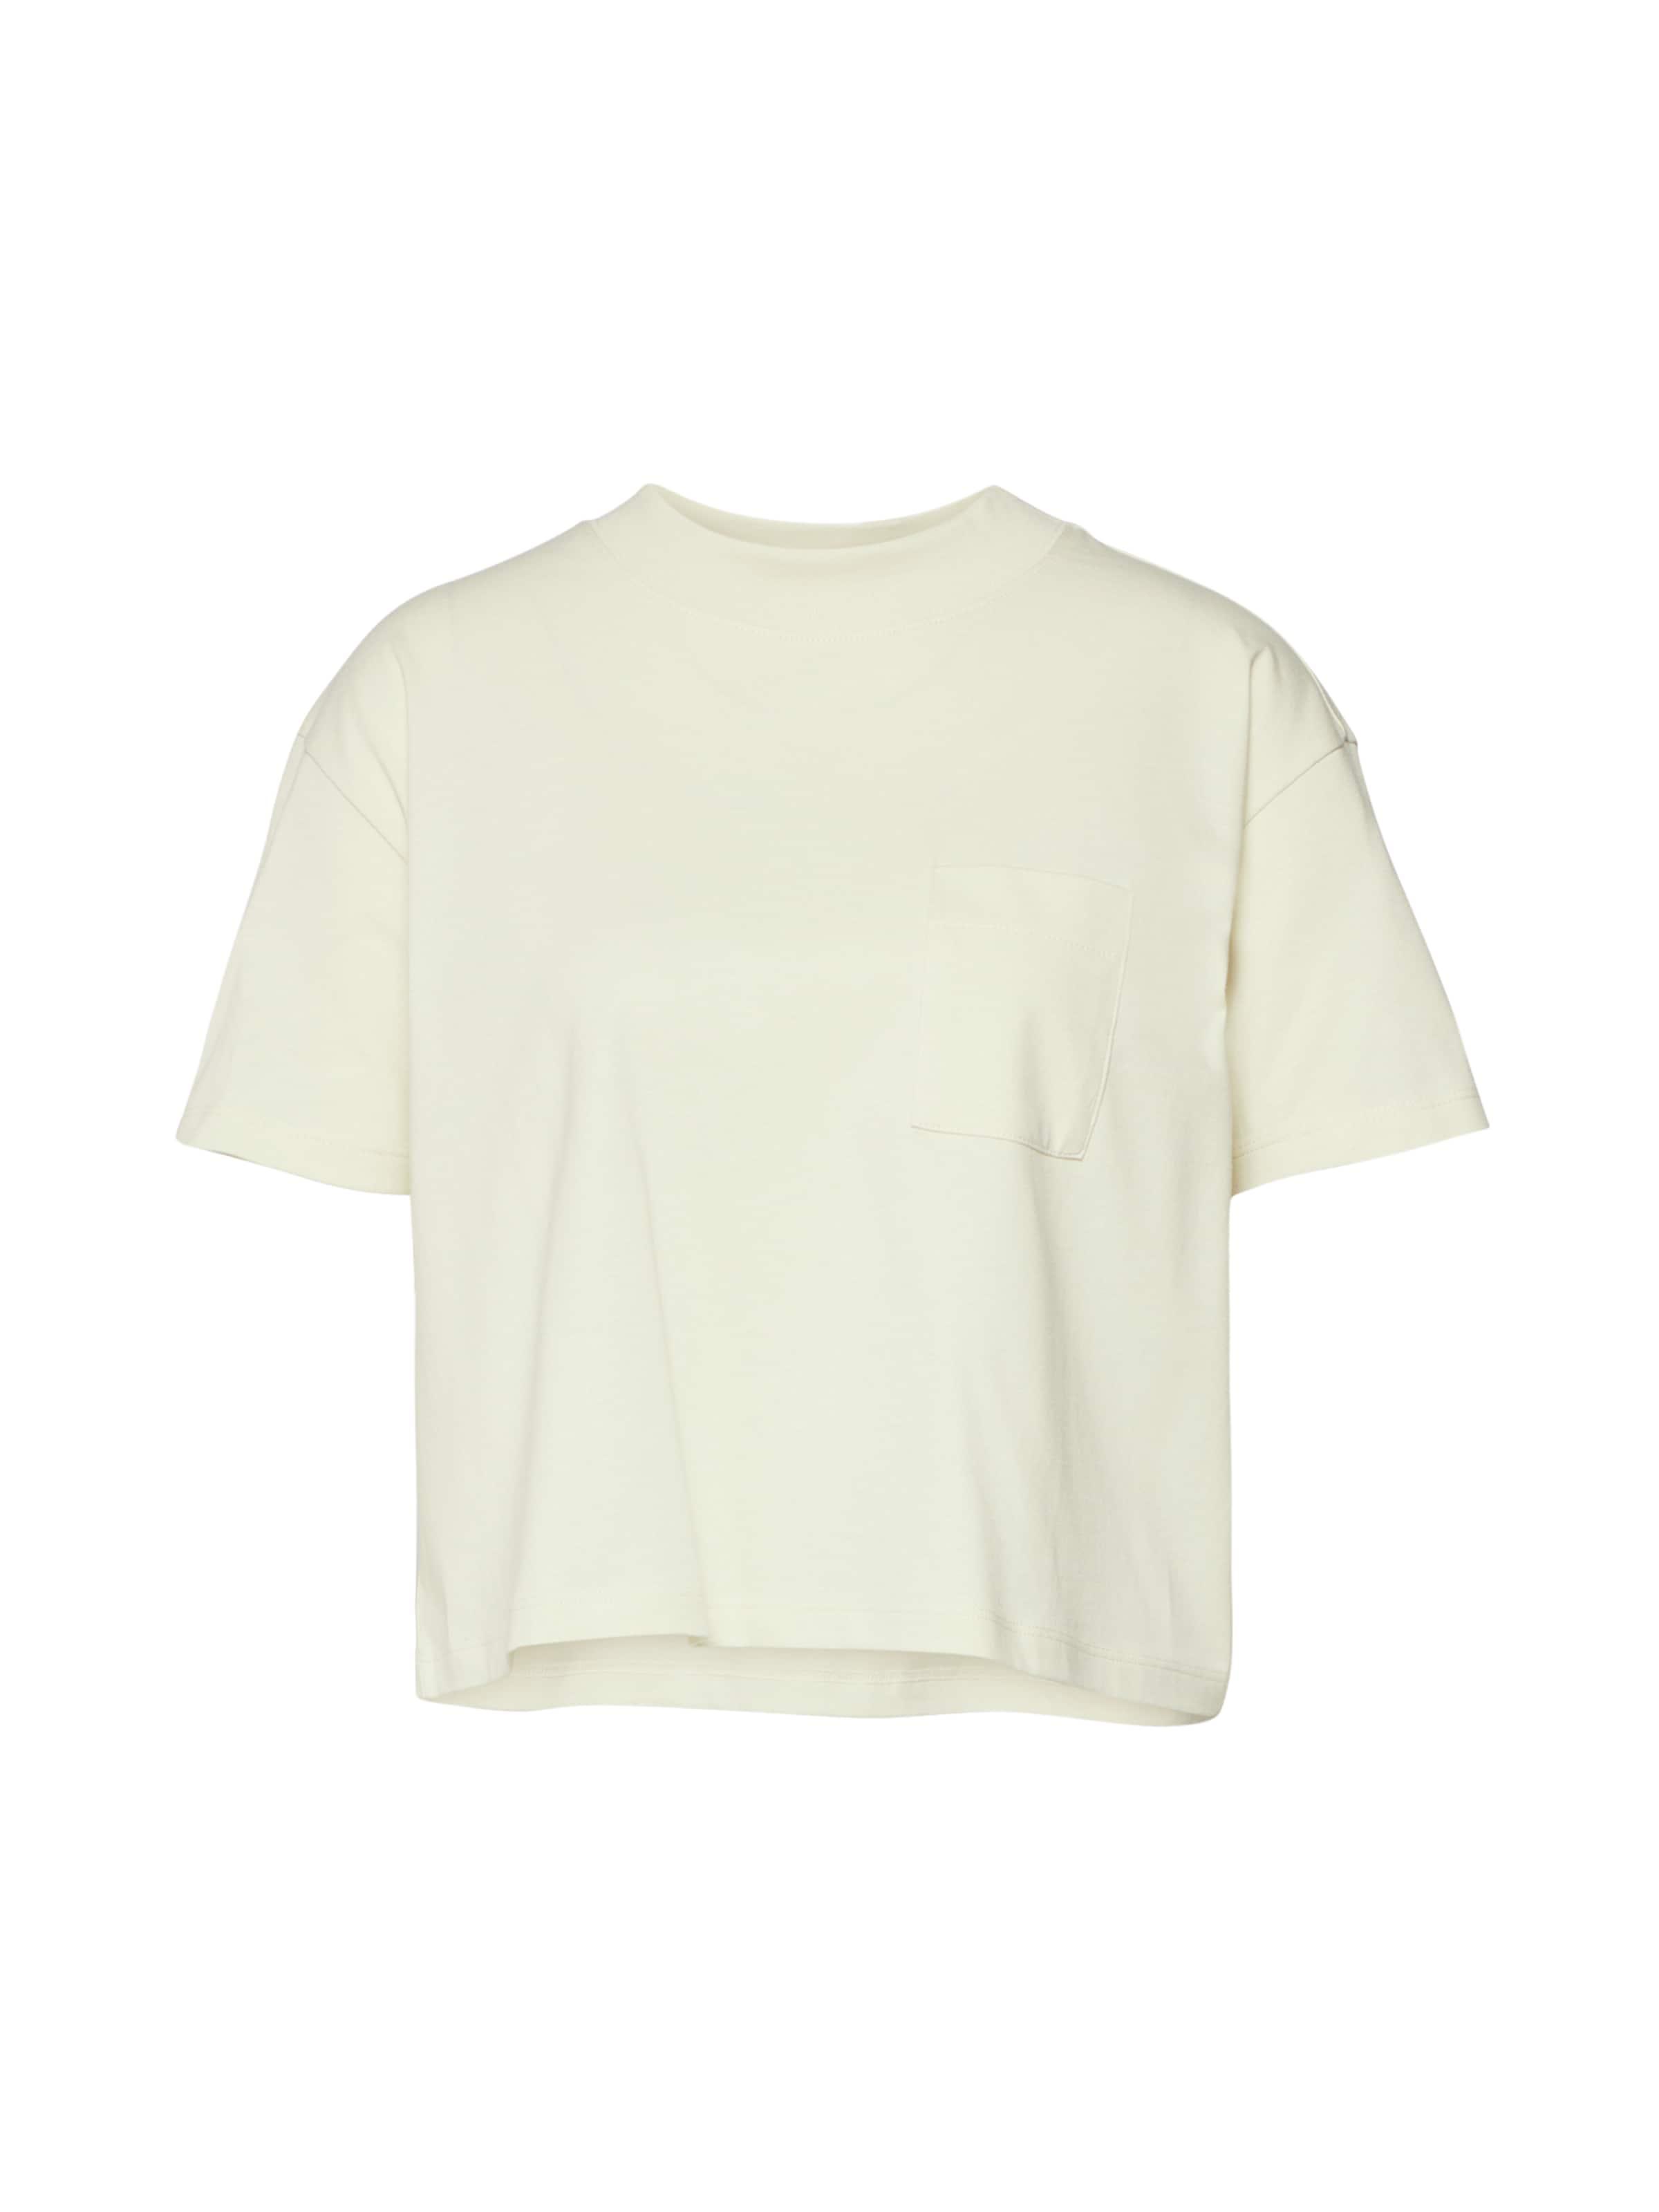 En Clair shirt Jaune 'jackie' T Edited ilZXuOkPwT